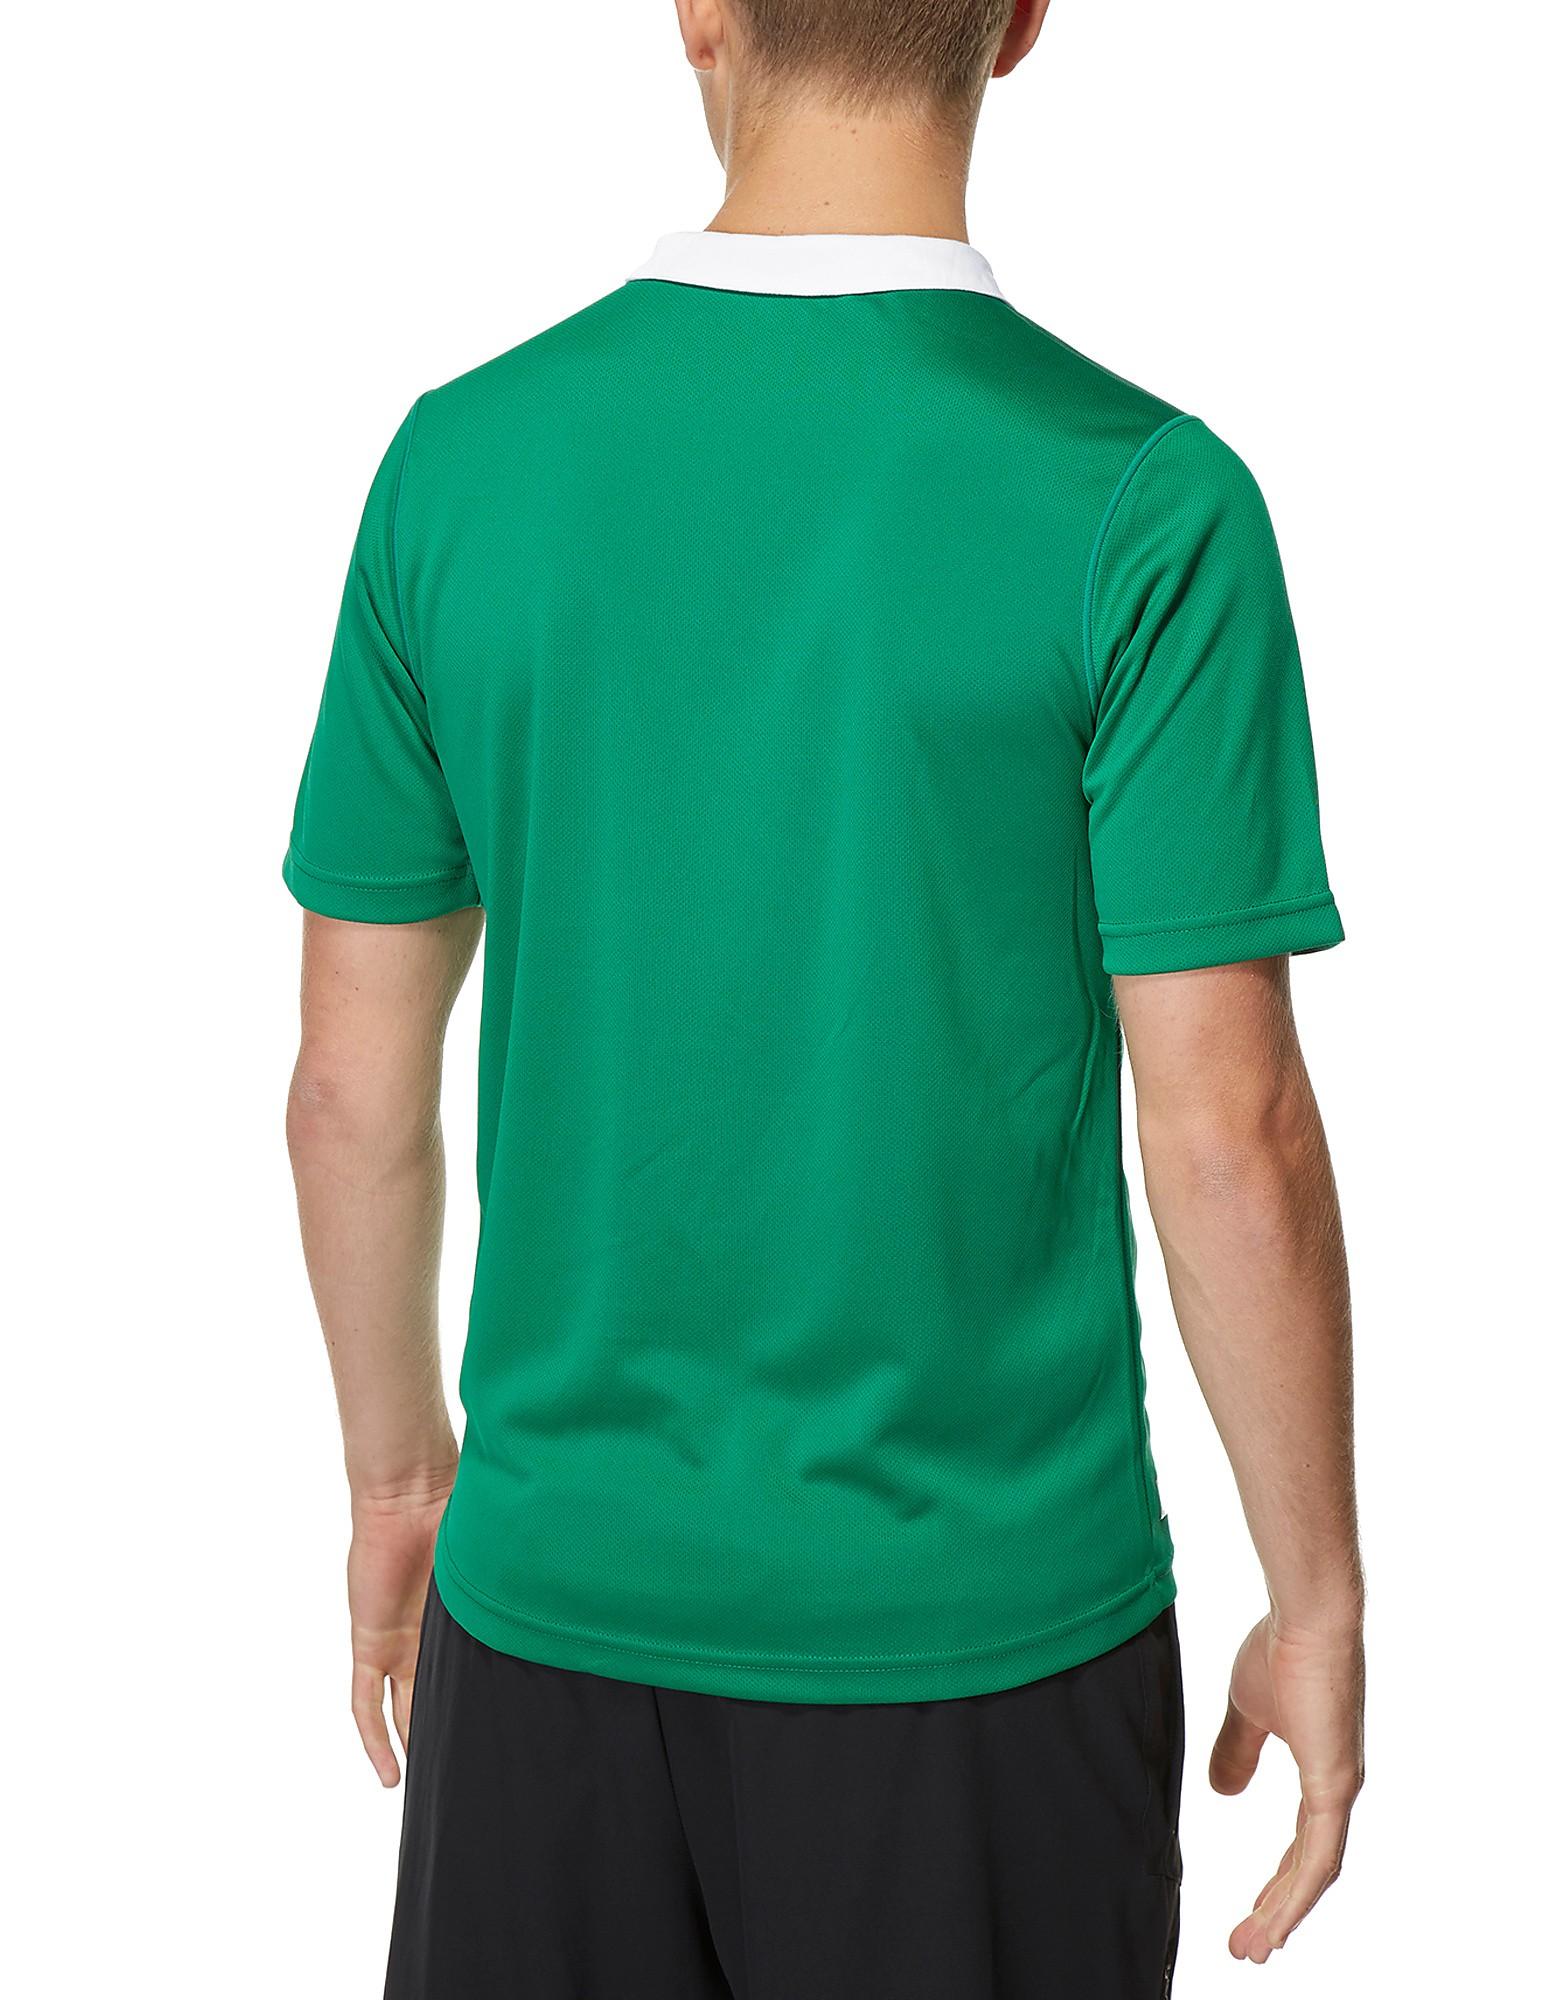 Canterbury IRFU 2014 Home Shirt